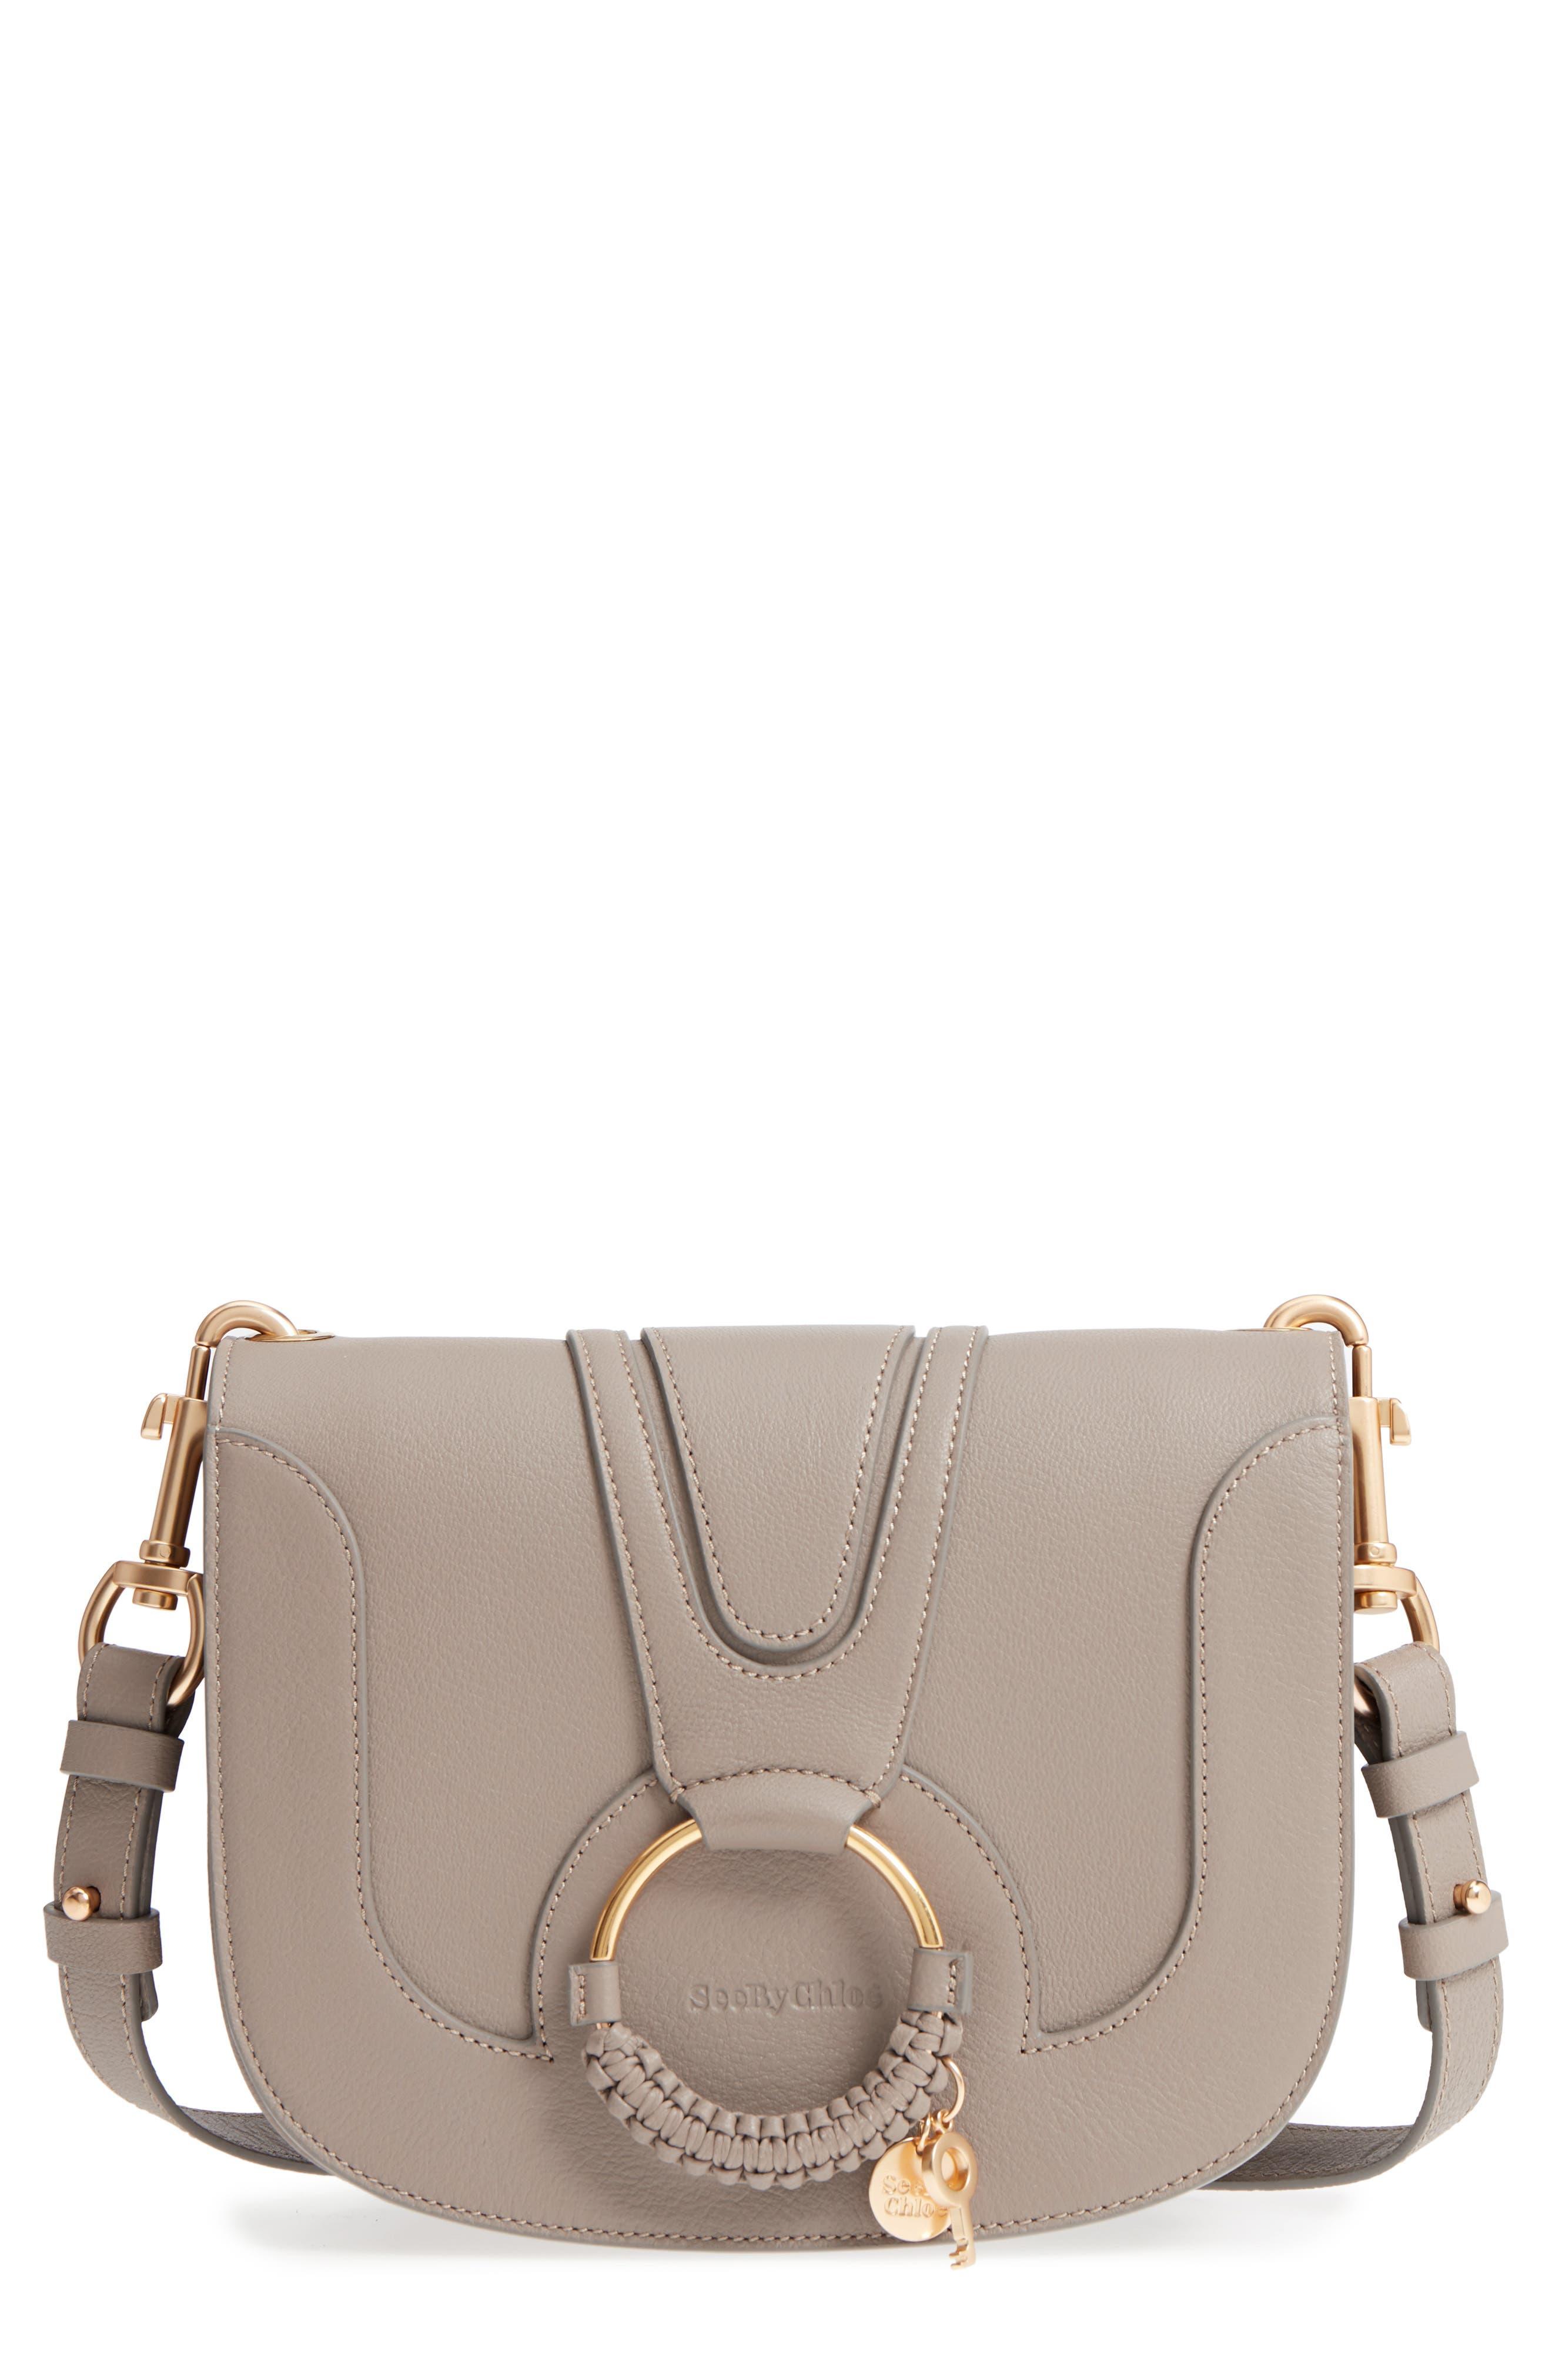 Hana Small Leather Crossbody Bag,                         Main,                         color, Motty Grey